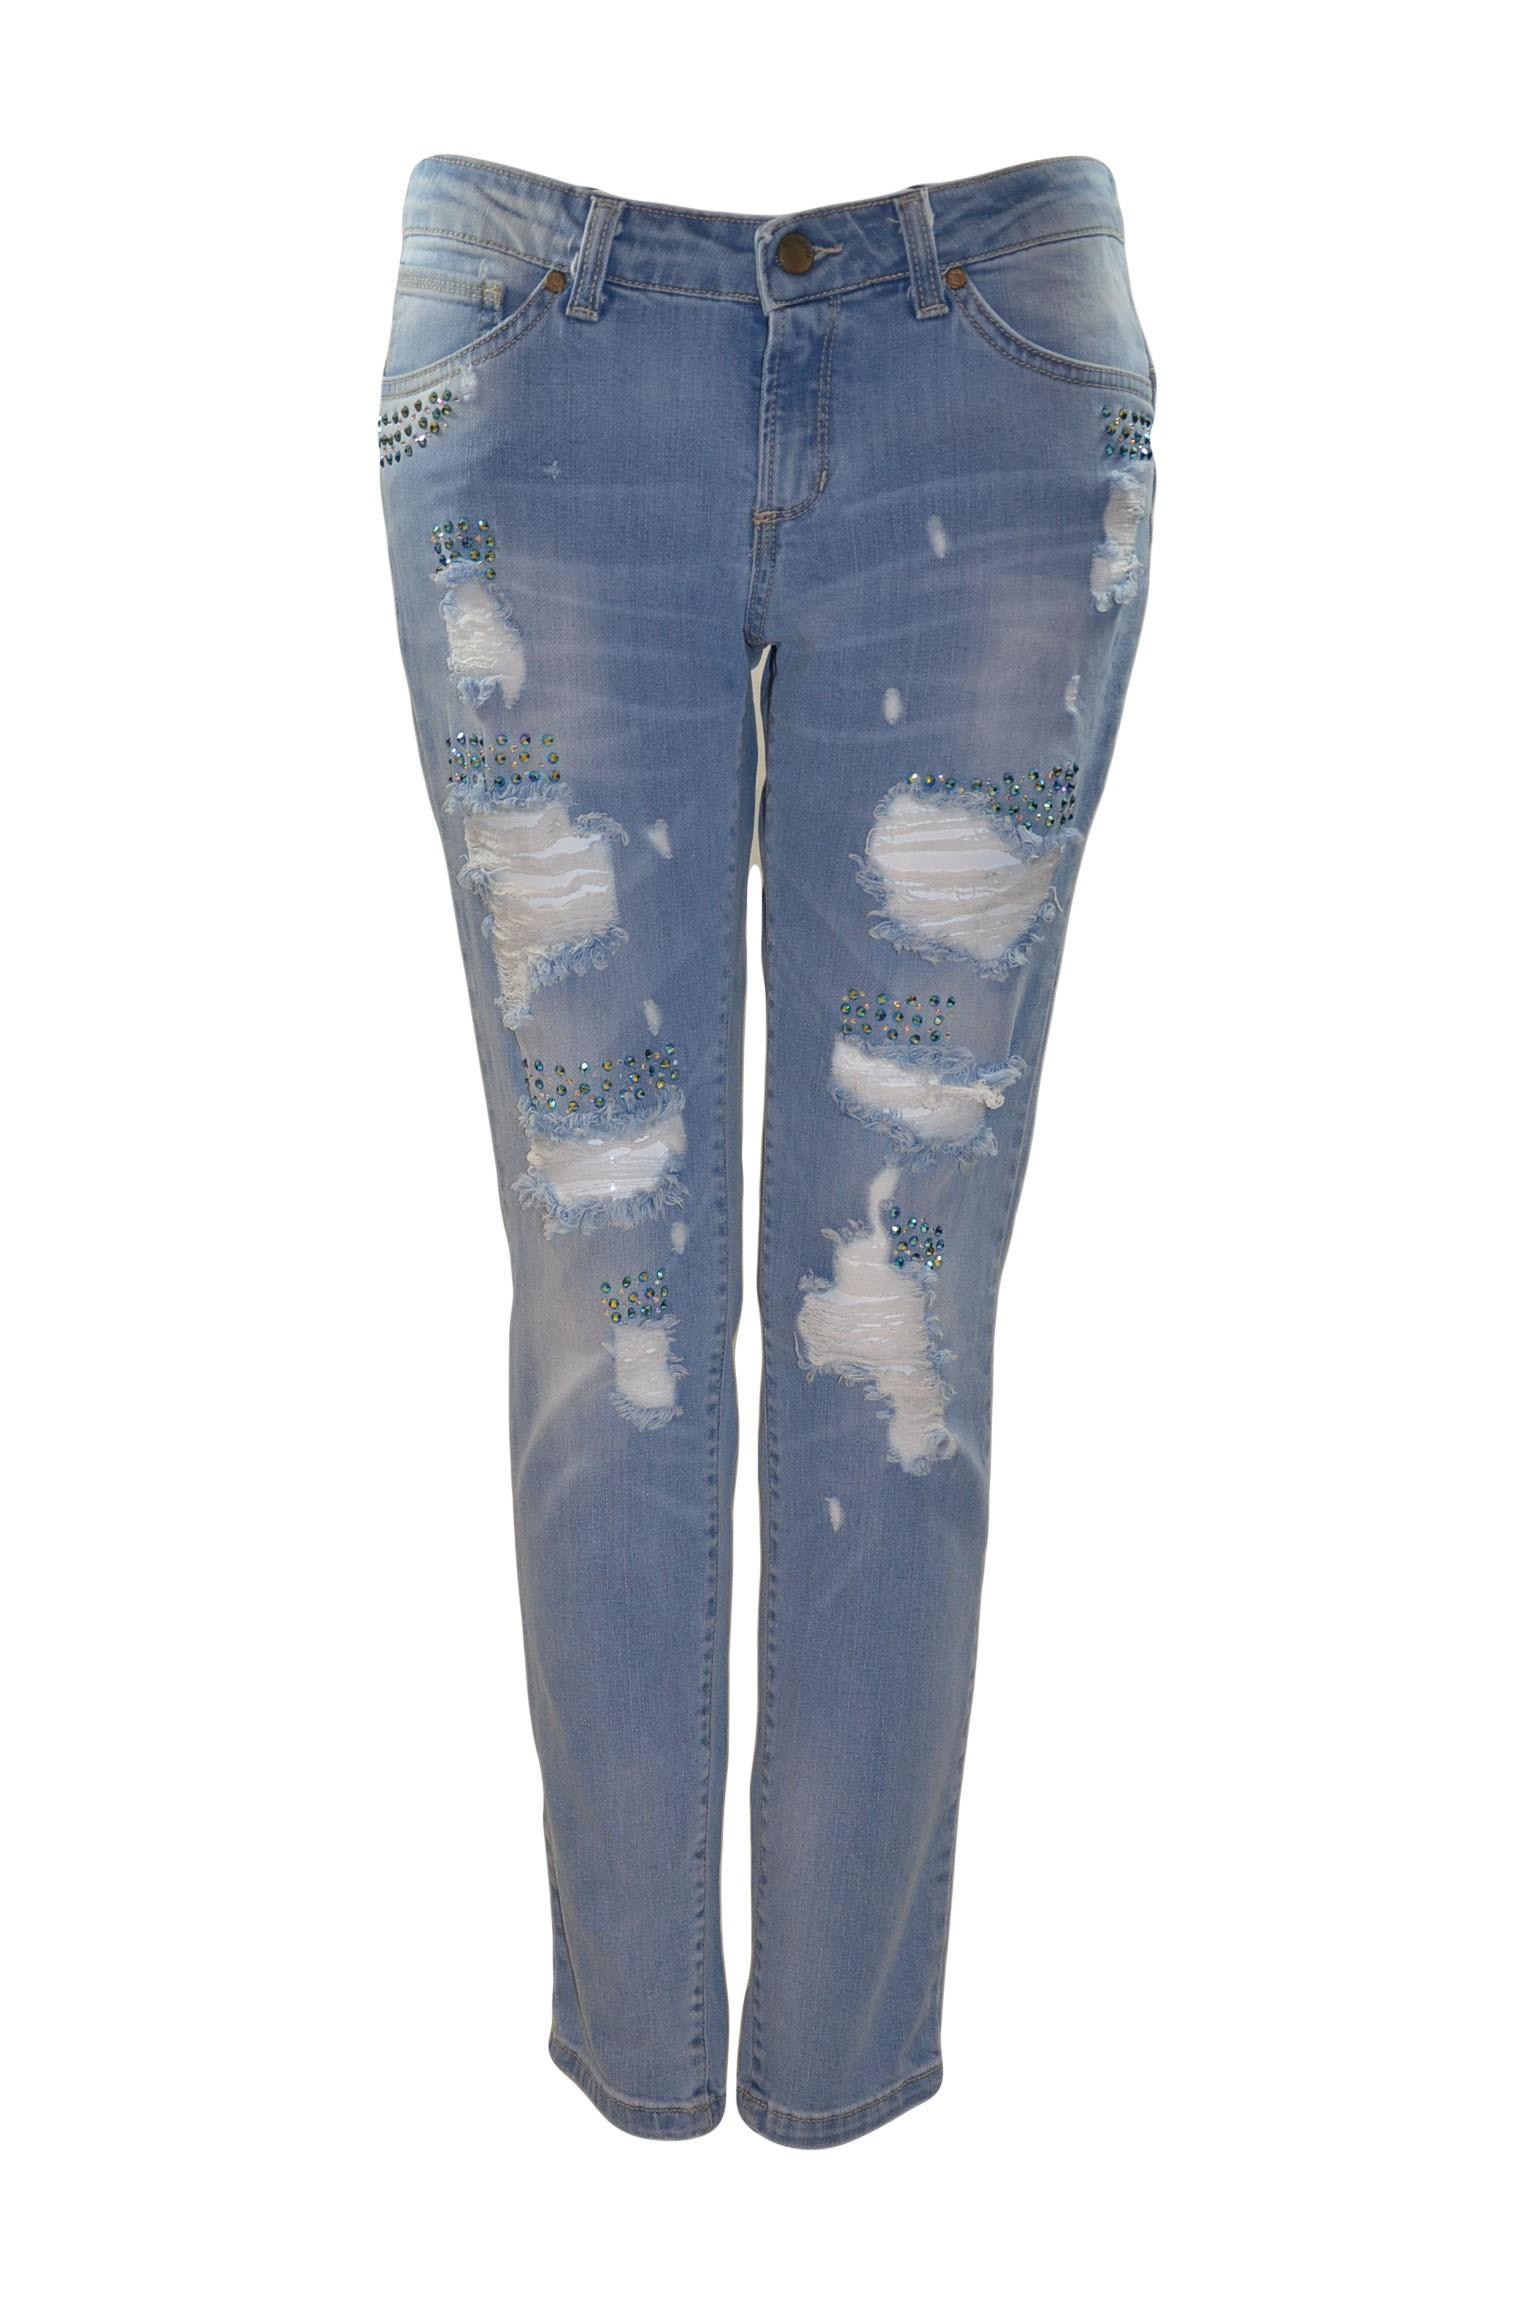 Rossodisera jeans j3088strass